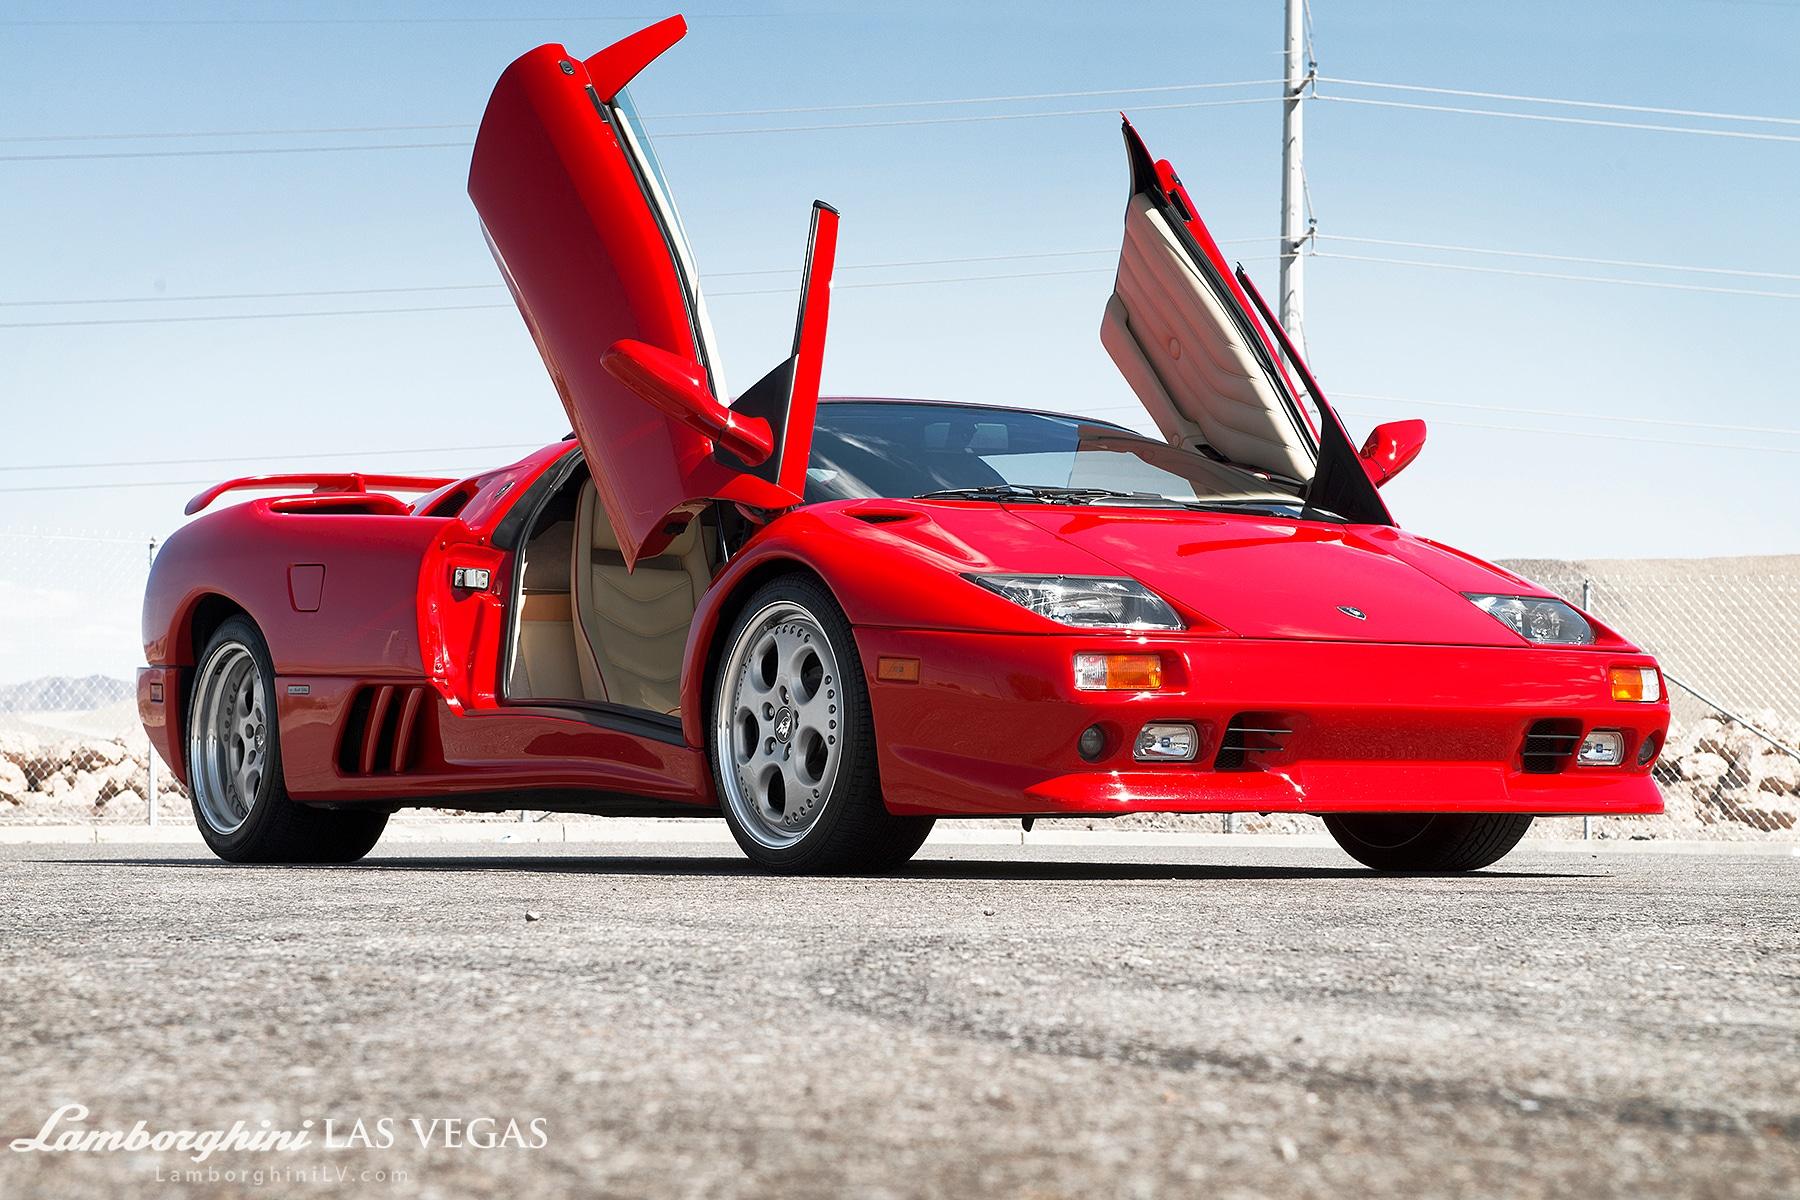 used 1999 lamborghini diablo for sale henderson nv rh lamborghinilasvegas com Diablo 1996 Lamborghini Diablo 2012